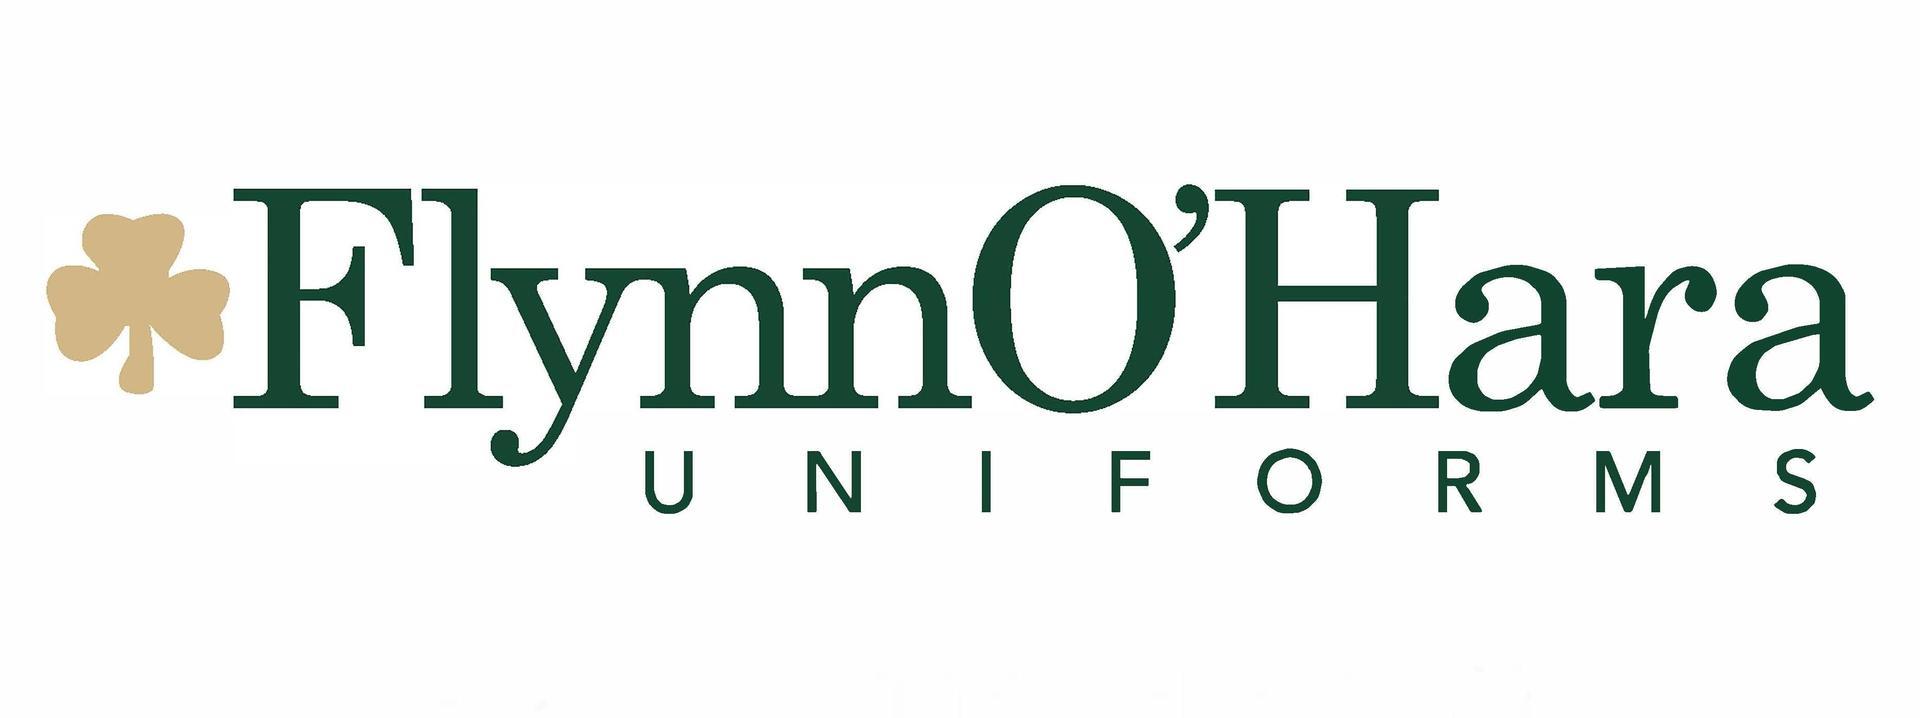 FlynnO'Hara Uniforms Logo